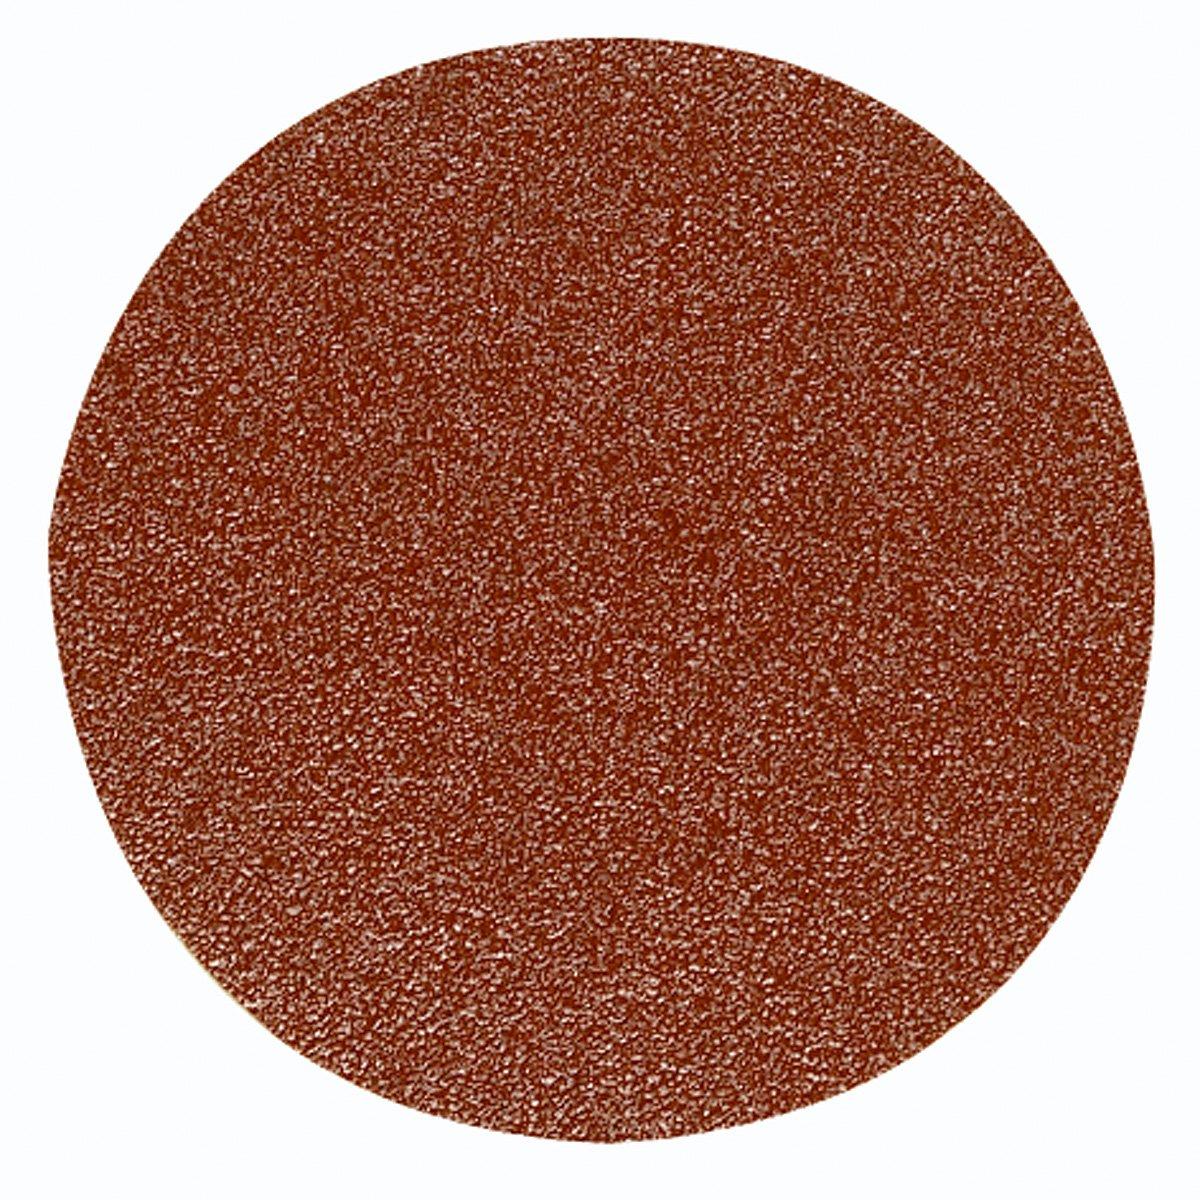 Salki Proxxon 2228549 Lot de 12/feuilles abrasifs grain 80/Corindon Lhw